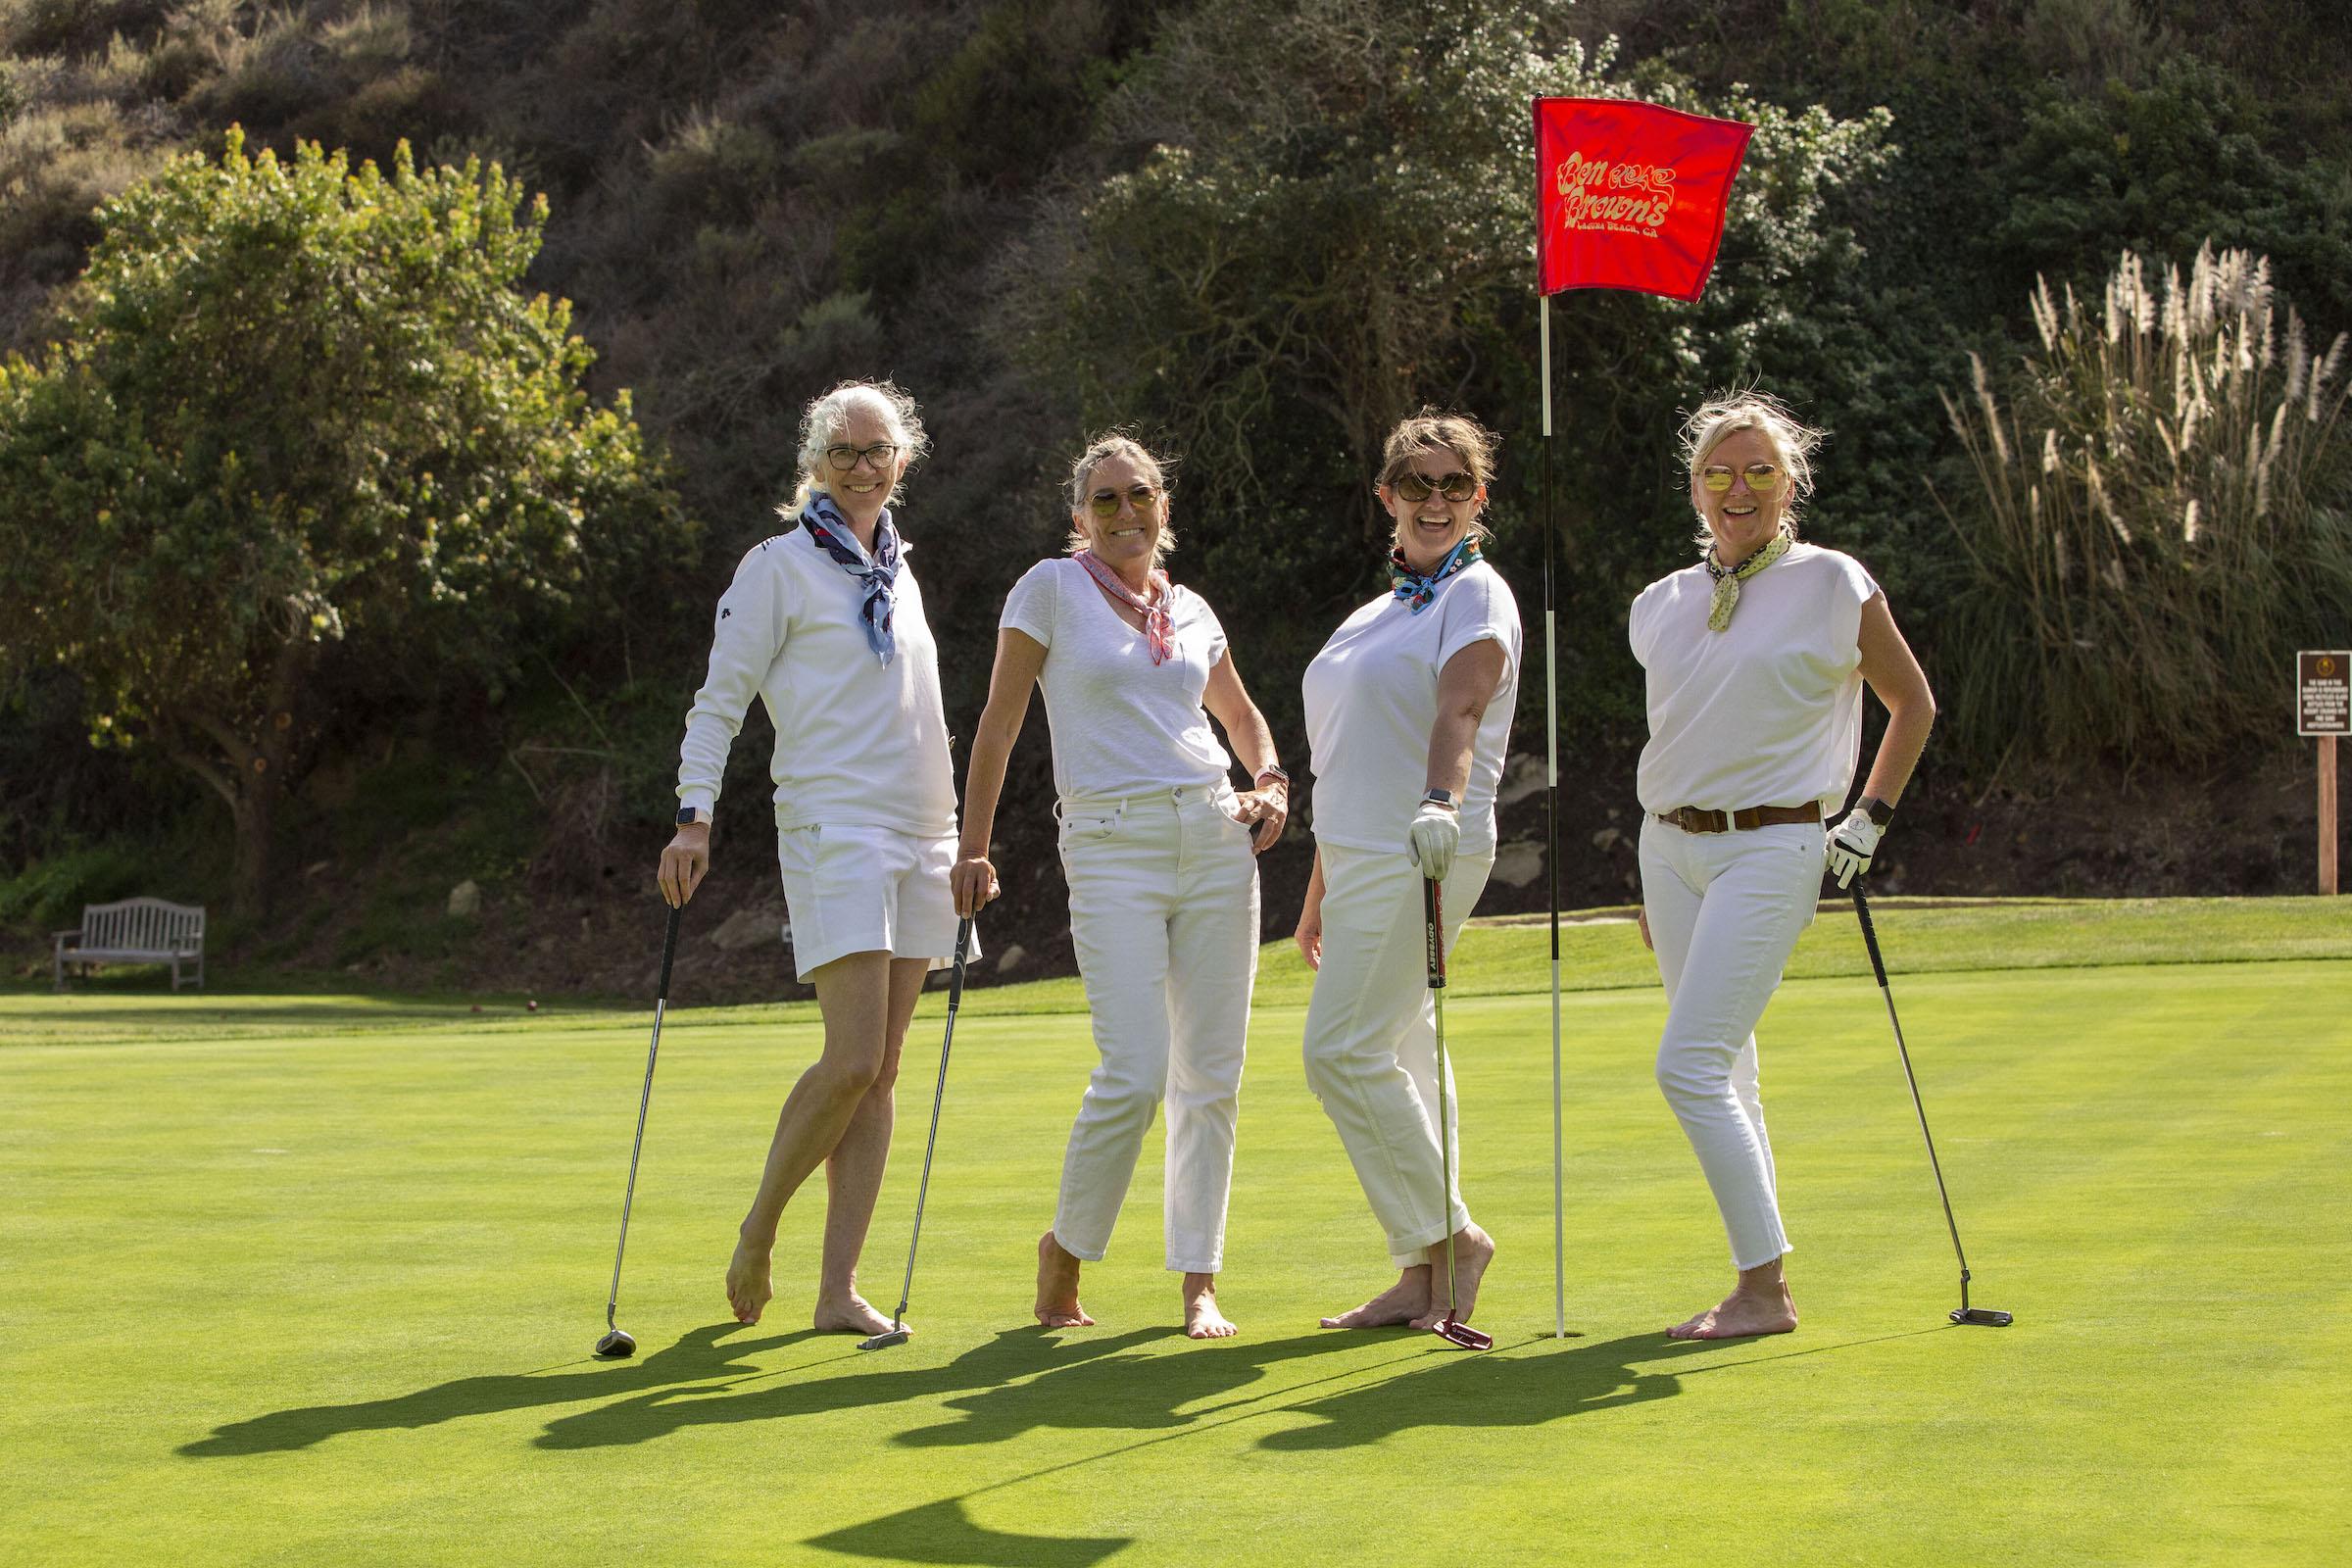 barefoot golfers